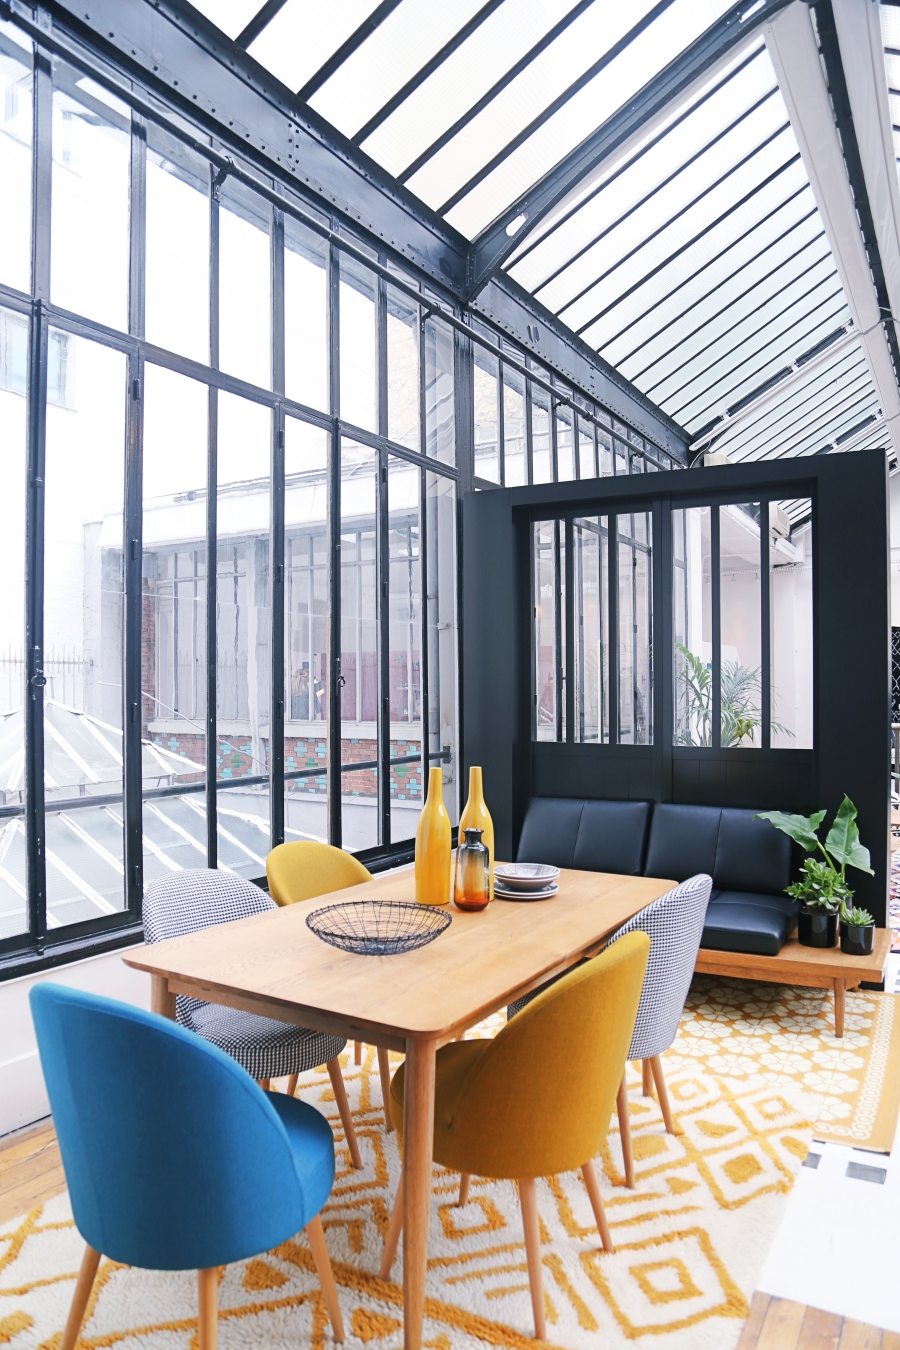 blog de moda y lifestyle press day in paris. Black Bedroom Furniture Sets. Home Design Ideas